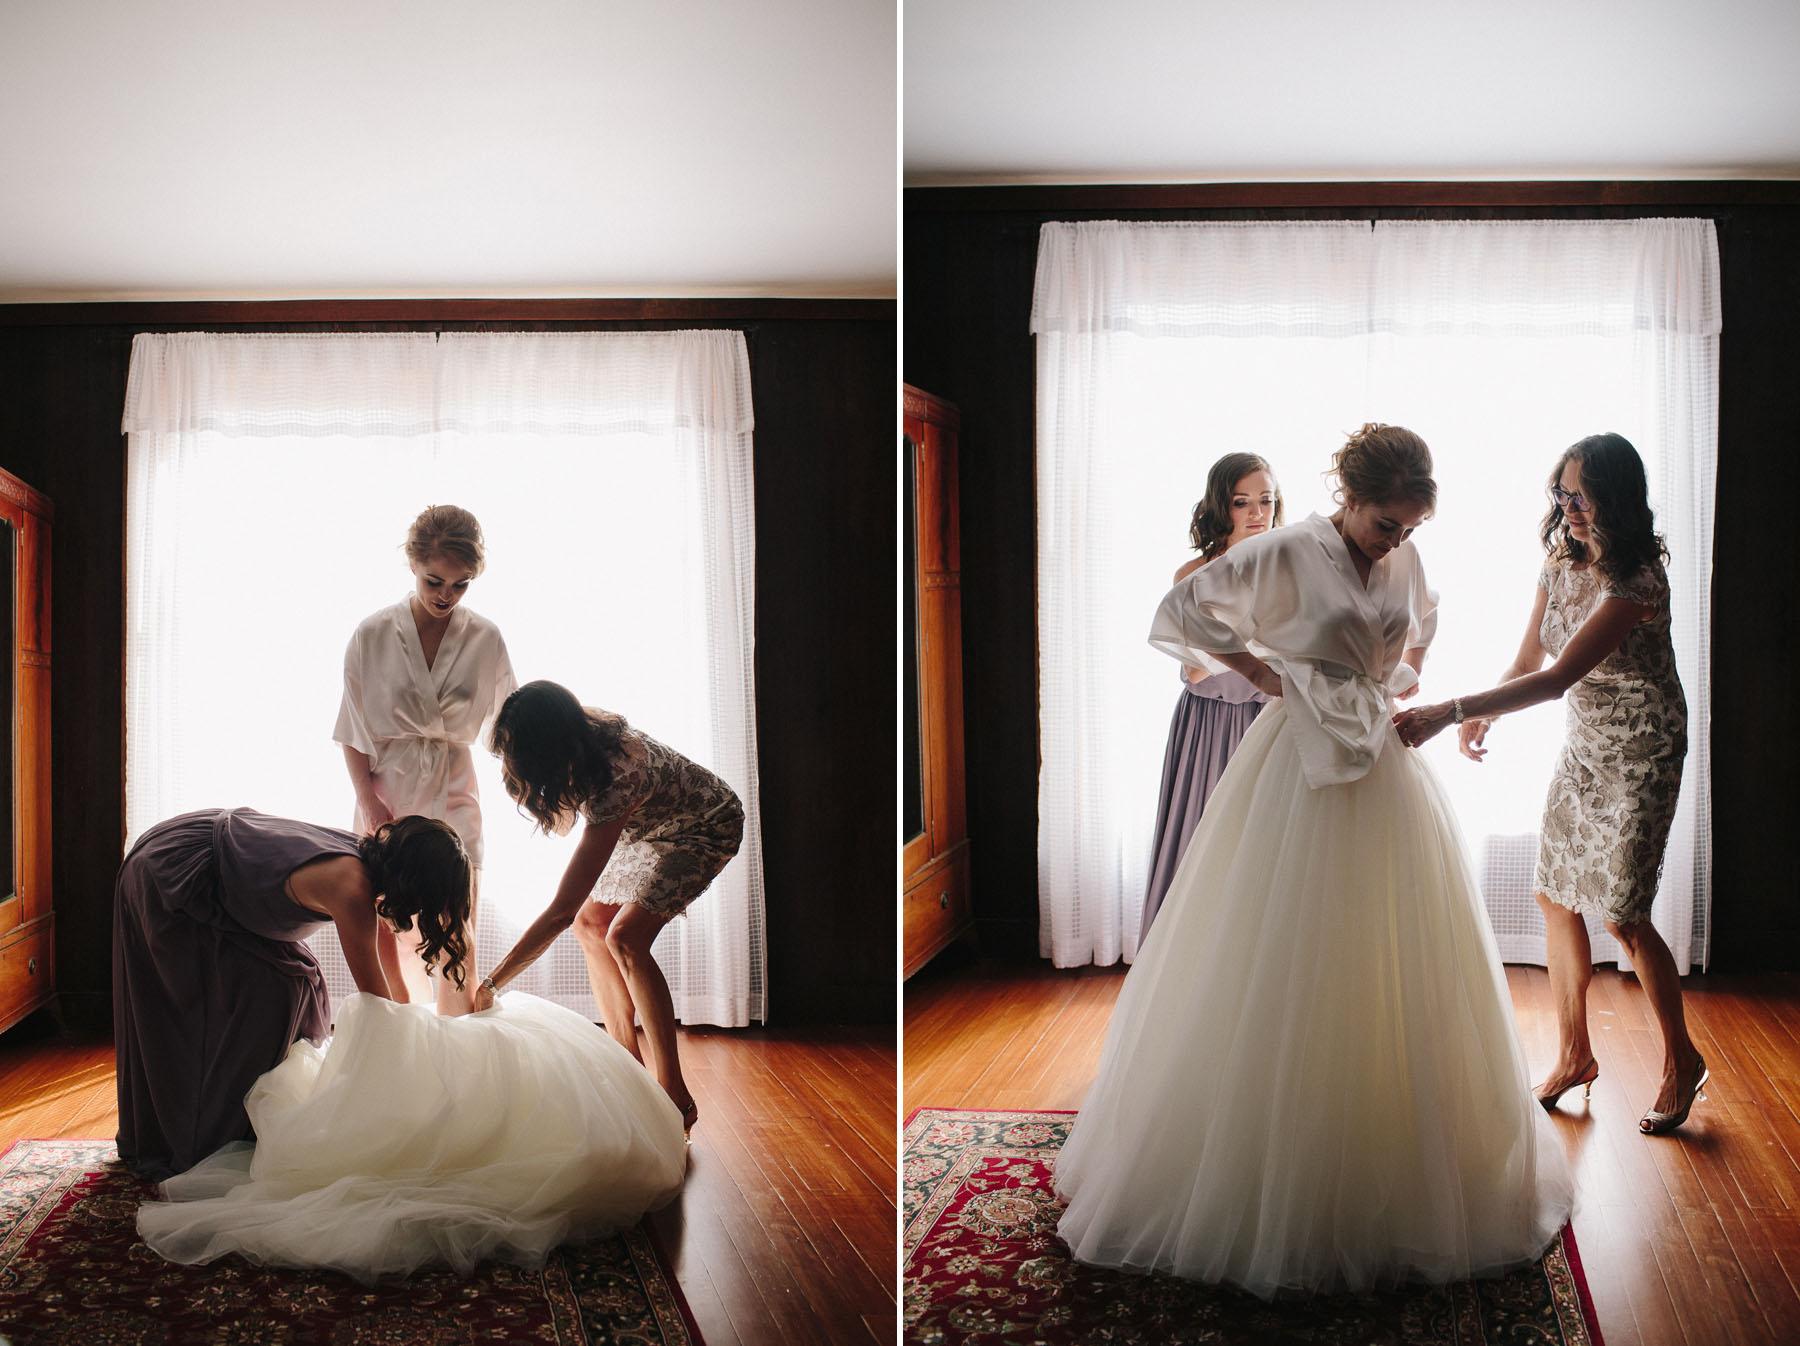 thetis-island-wedding-photographer-rp-rn-045.jpg